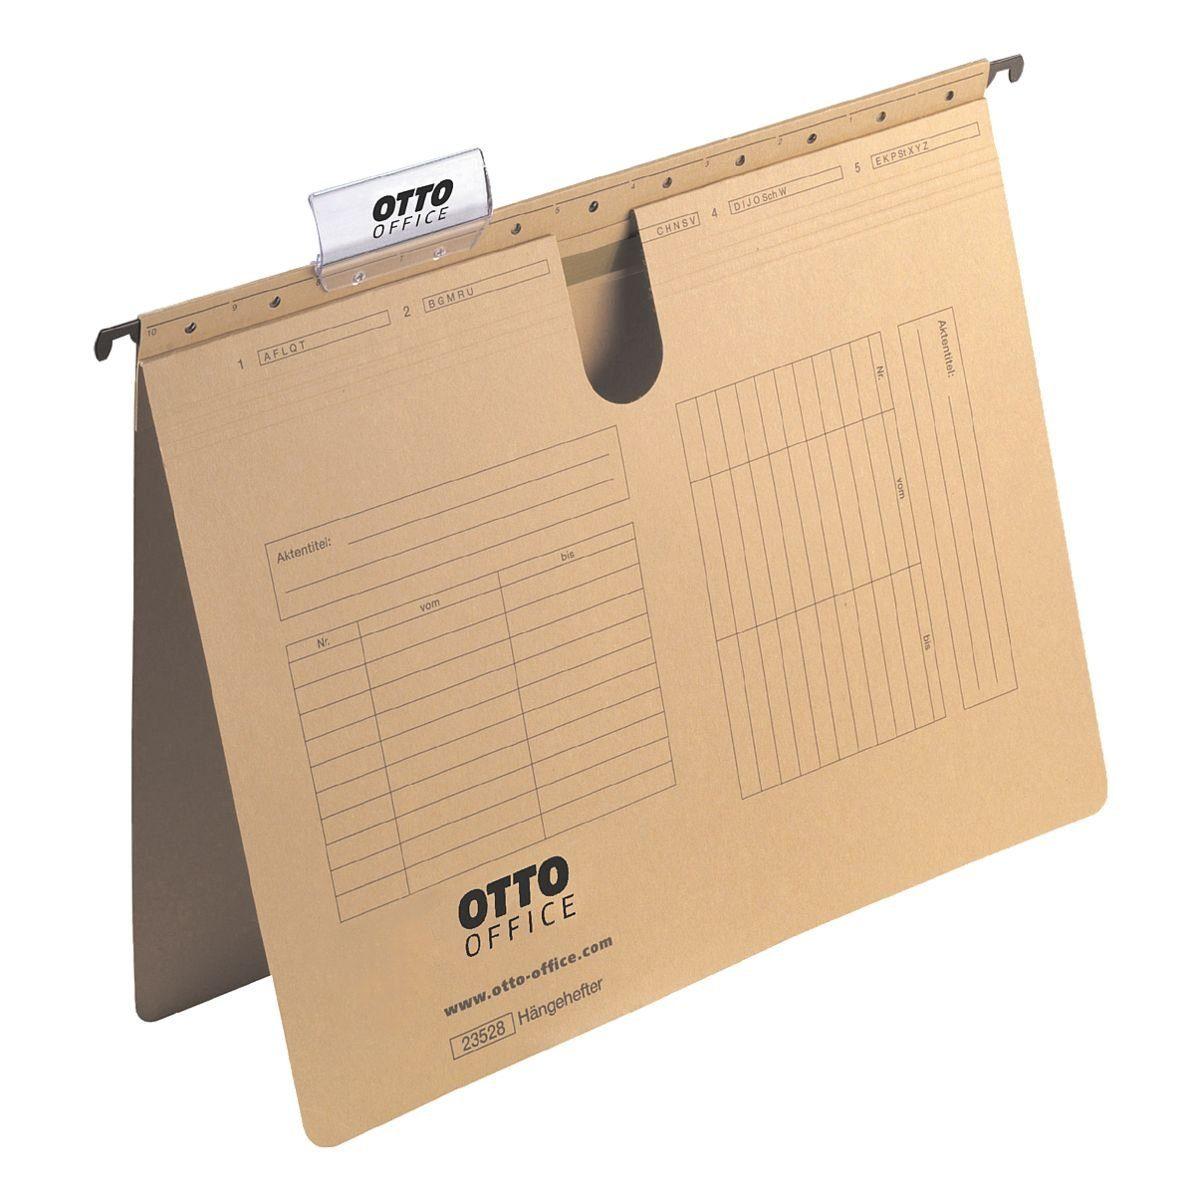 OTTO Office Standard Hängehefter